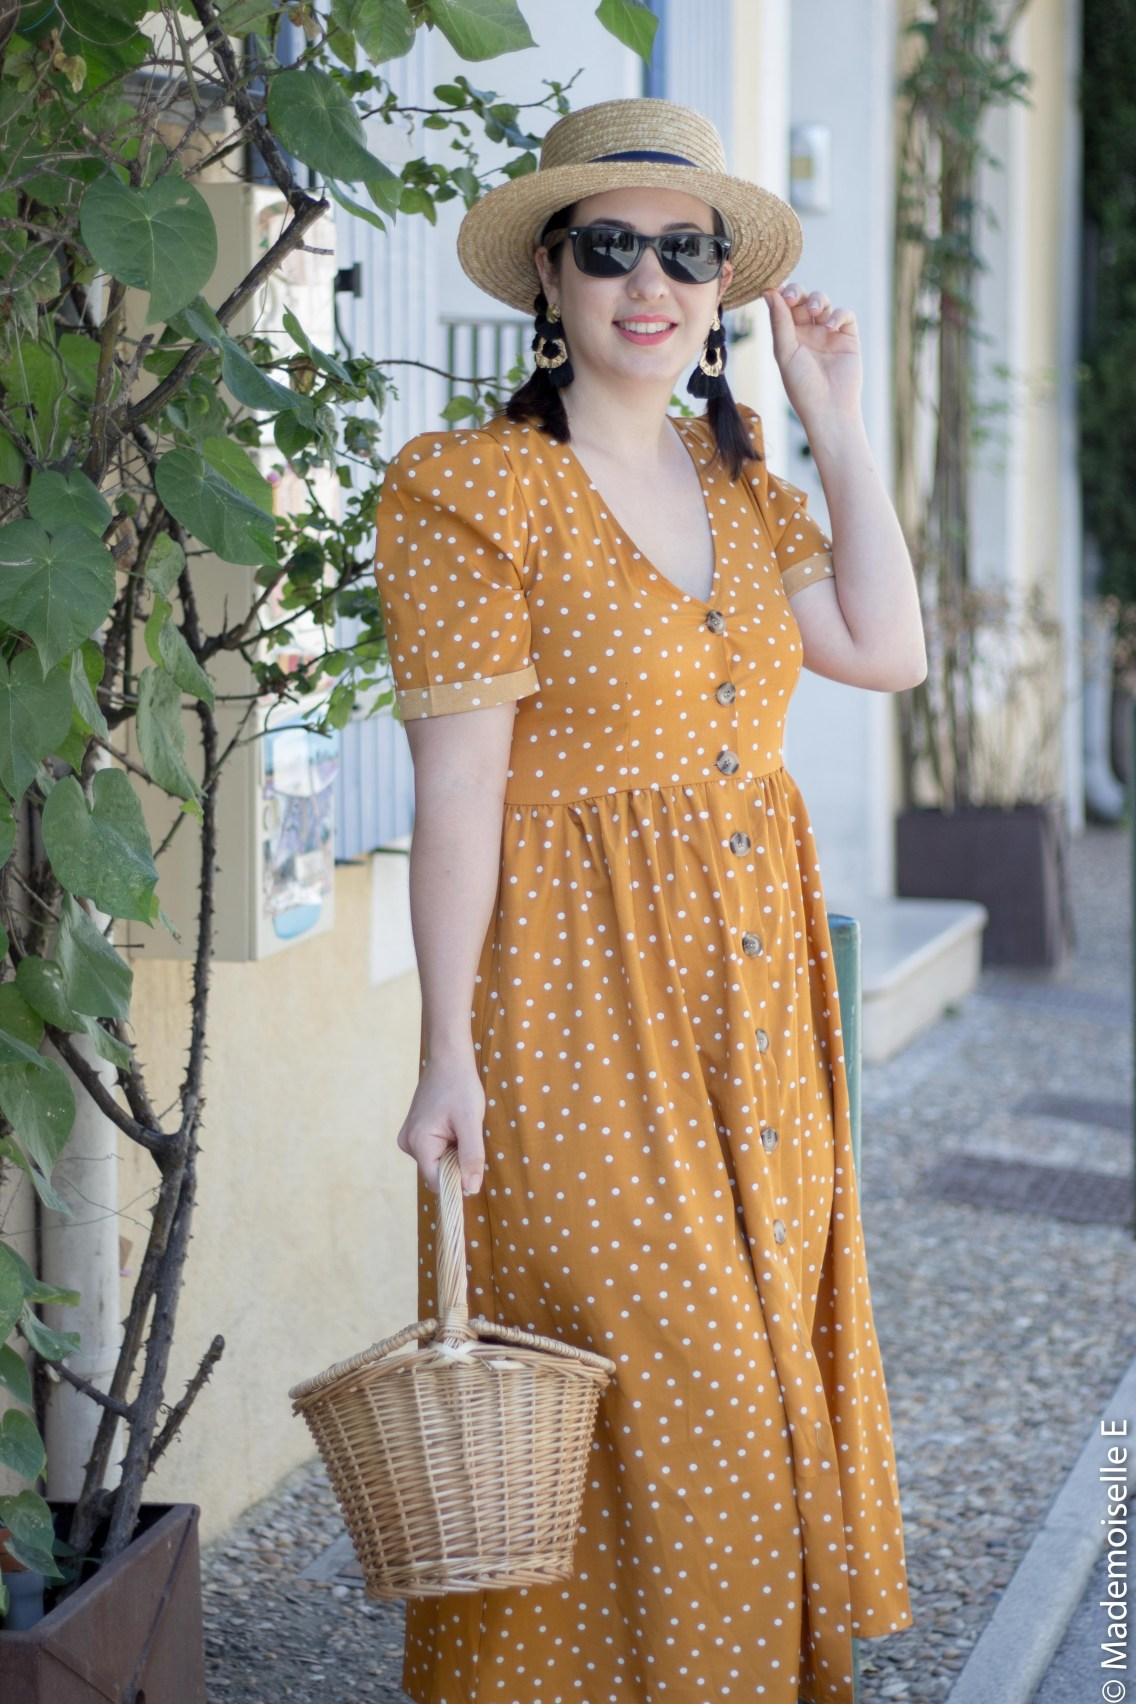 robe pois moutarde tendance été 12 mademoiselle-e